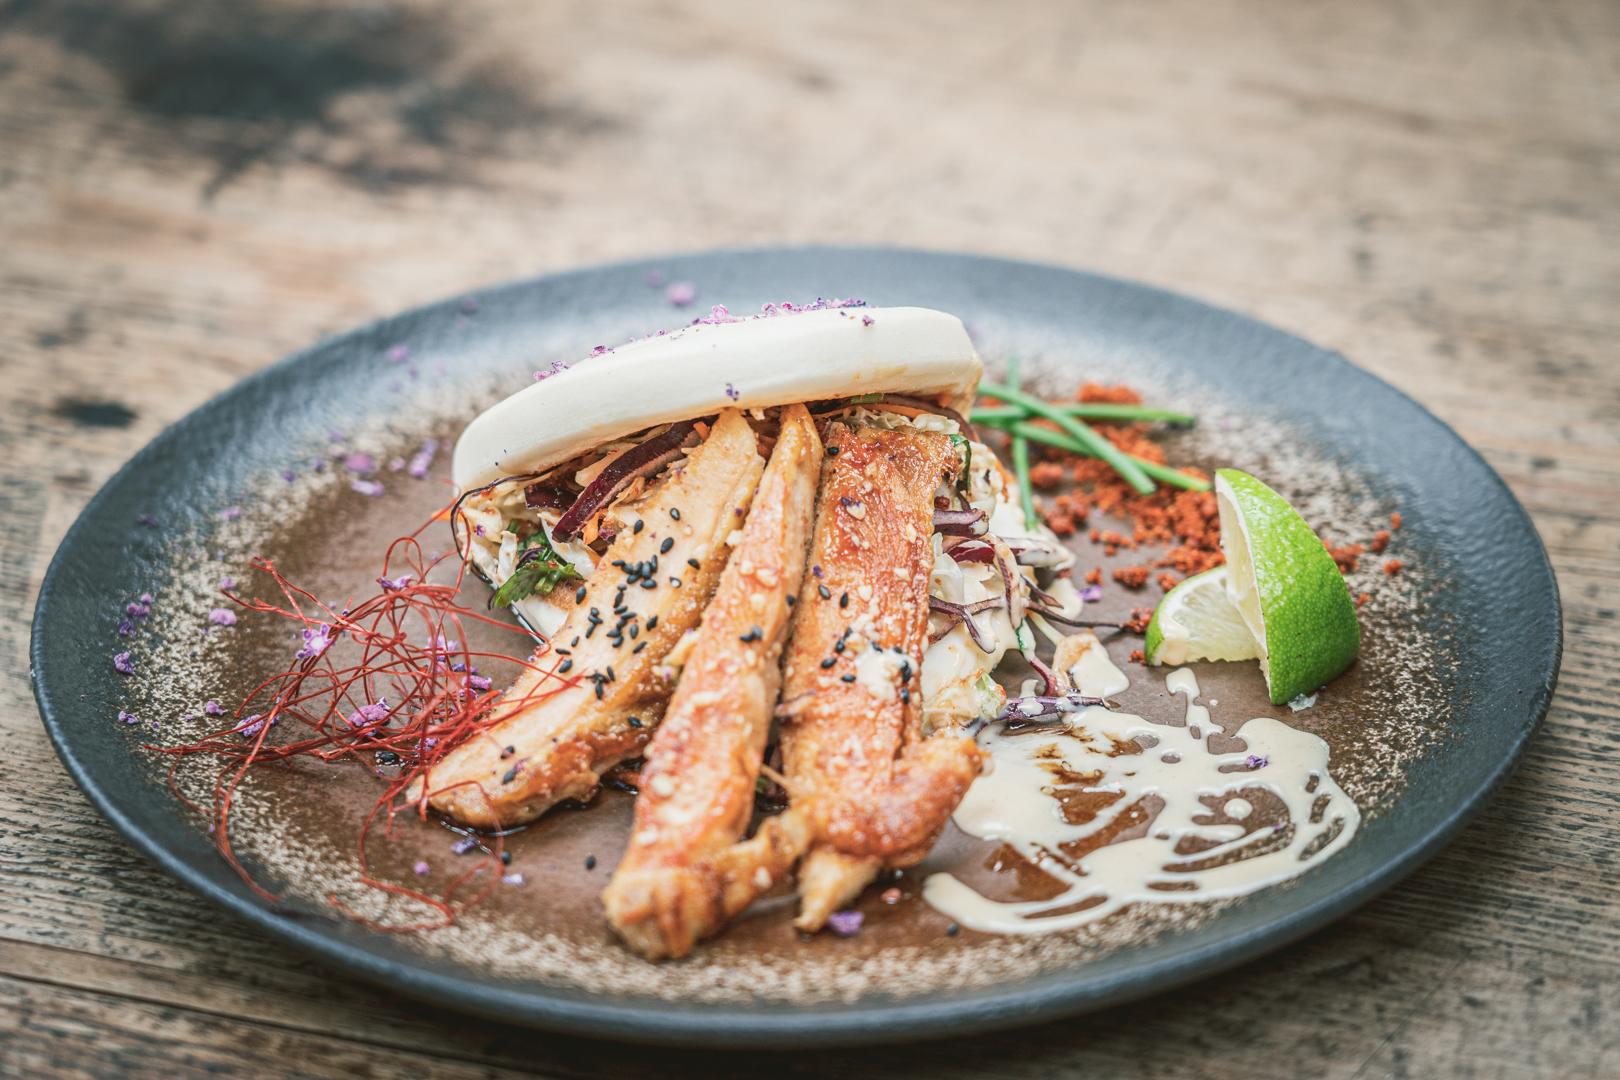 Shooting culinaire lyon same same 4 Colors - Gua Bao